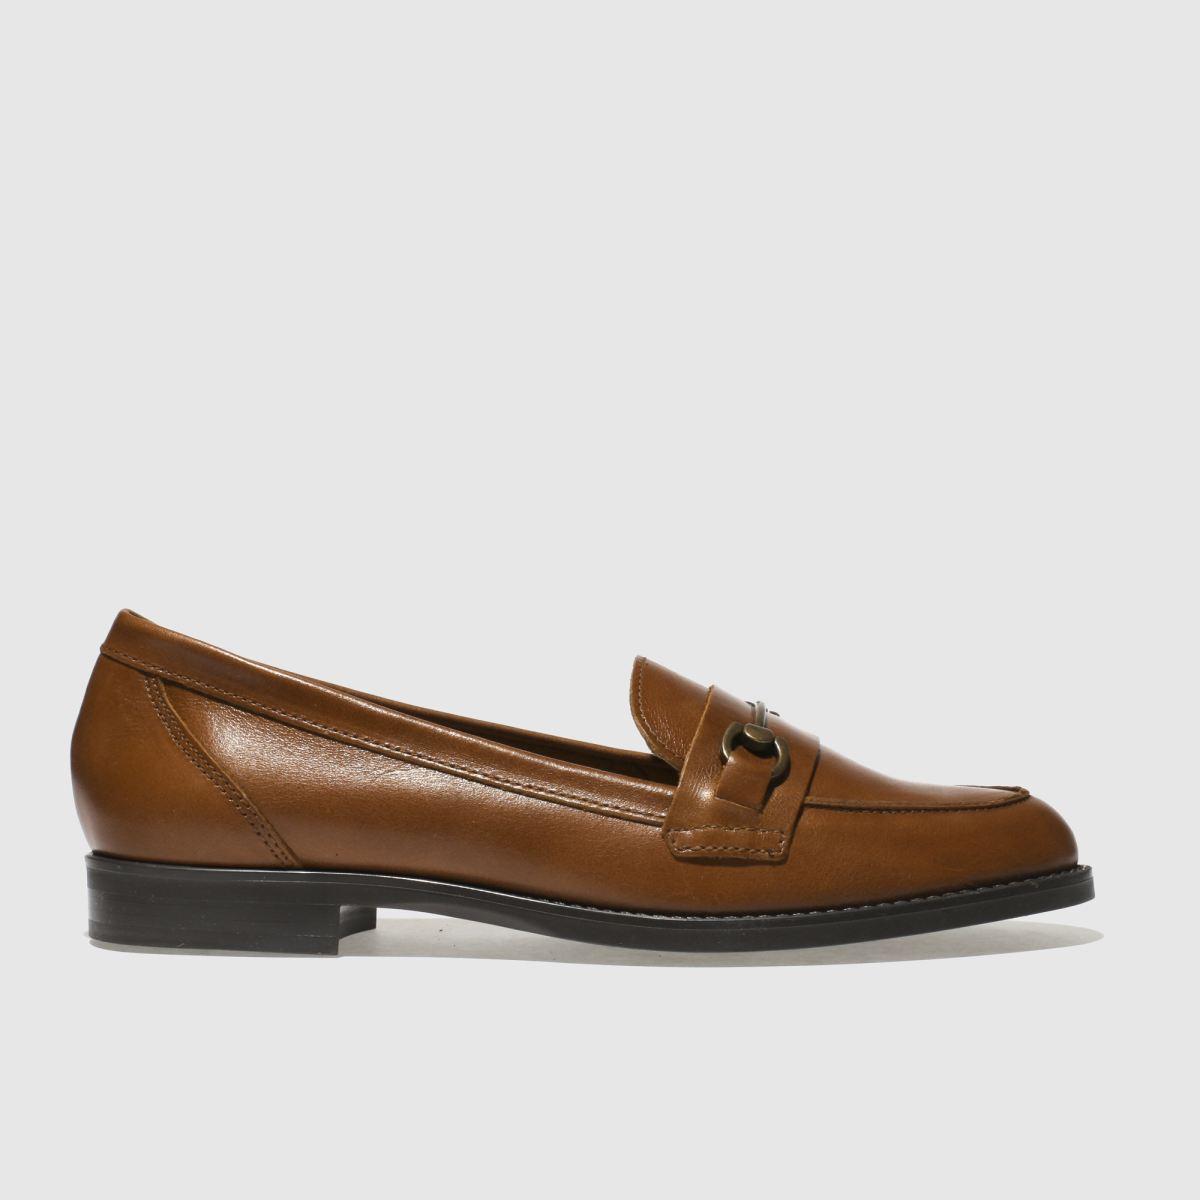 Schuh Tan Infinity Flat Shoes